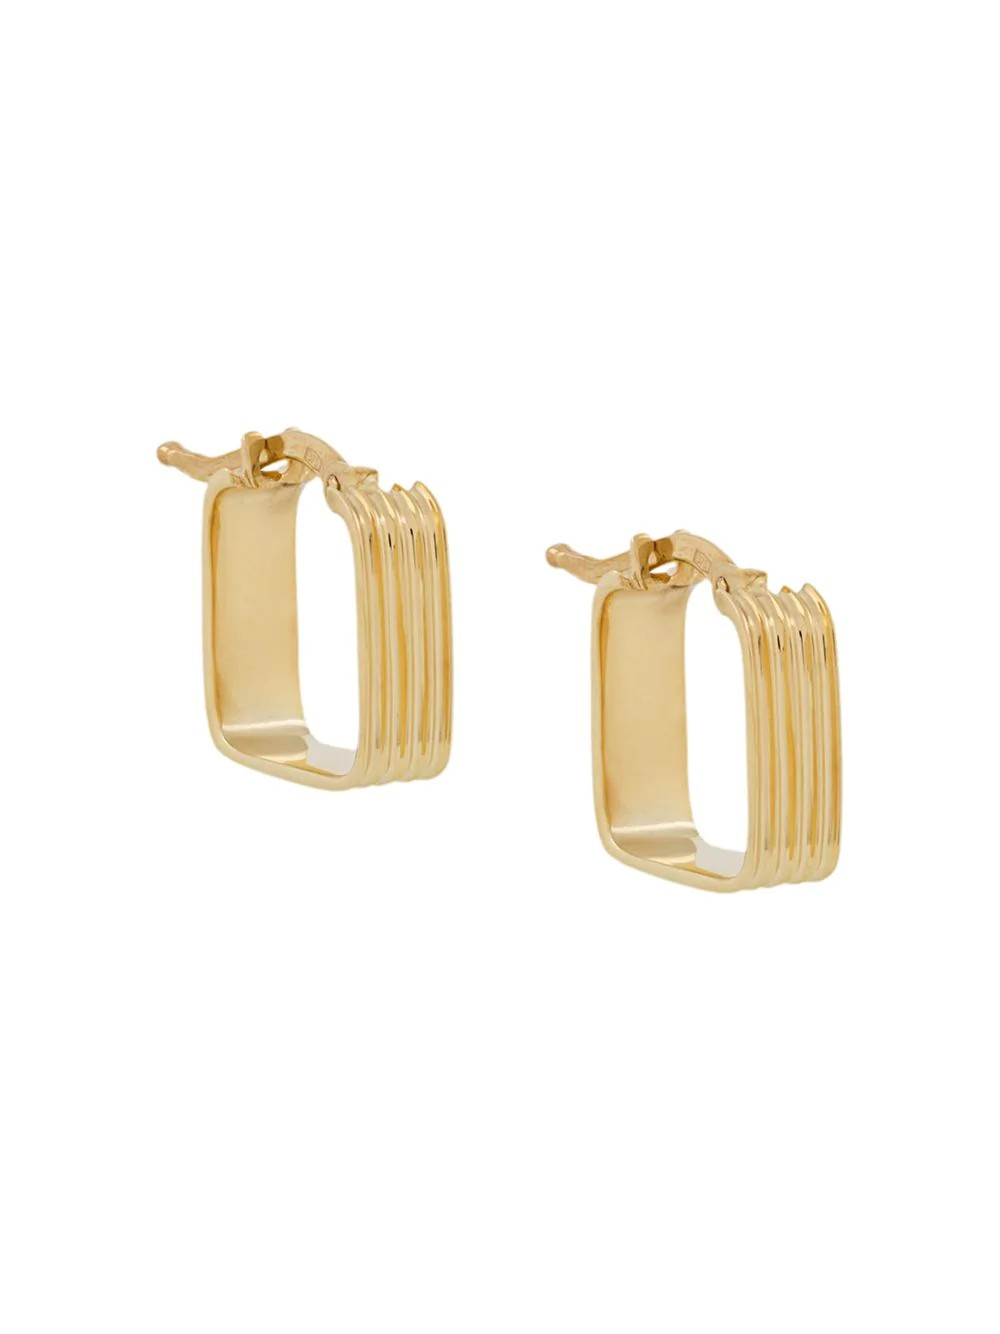 EPAR7C0000YG09K J1000 YELLOW GOLD